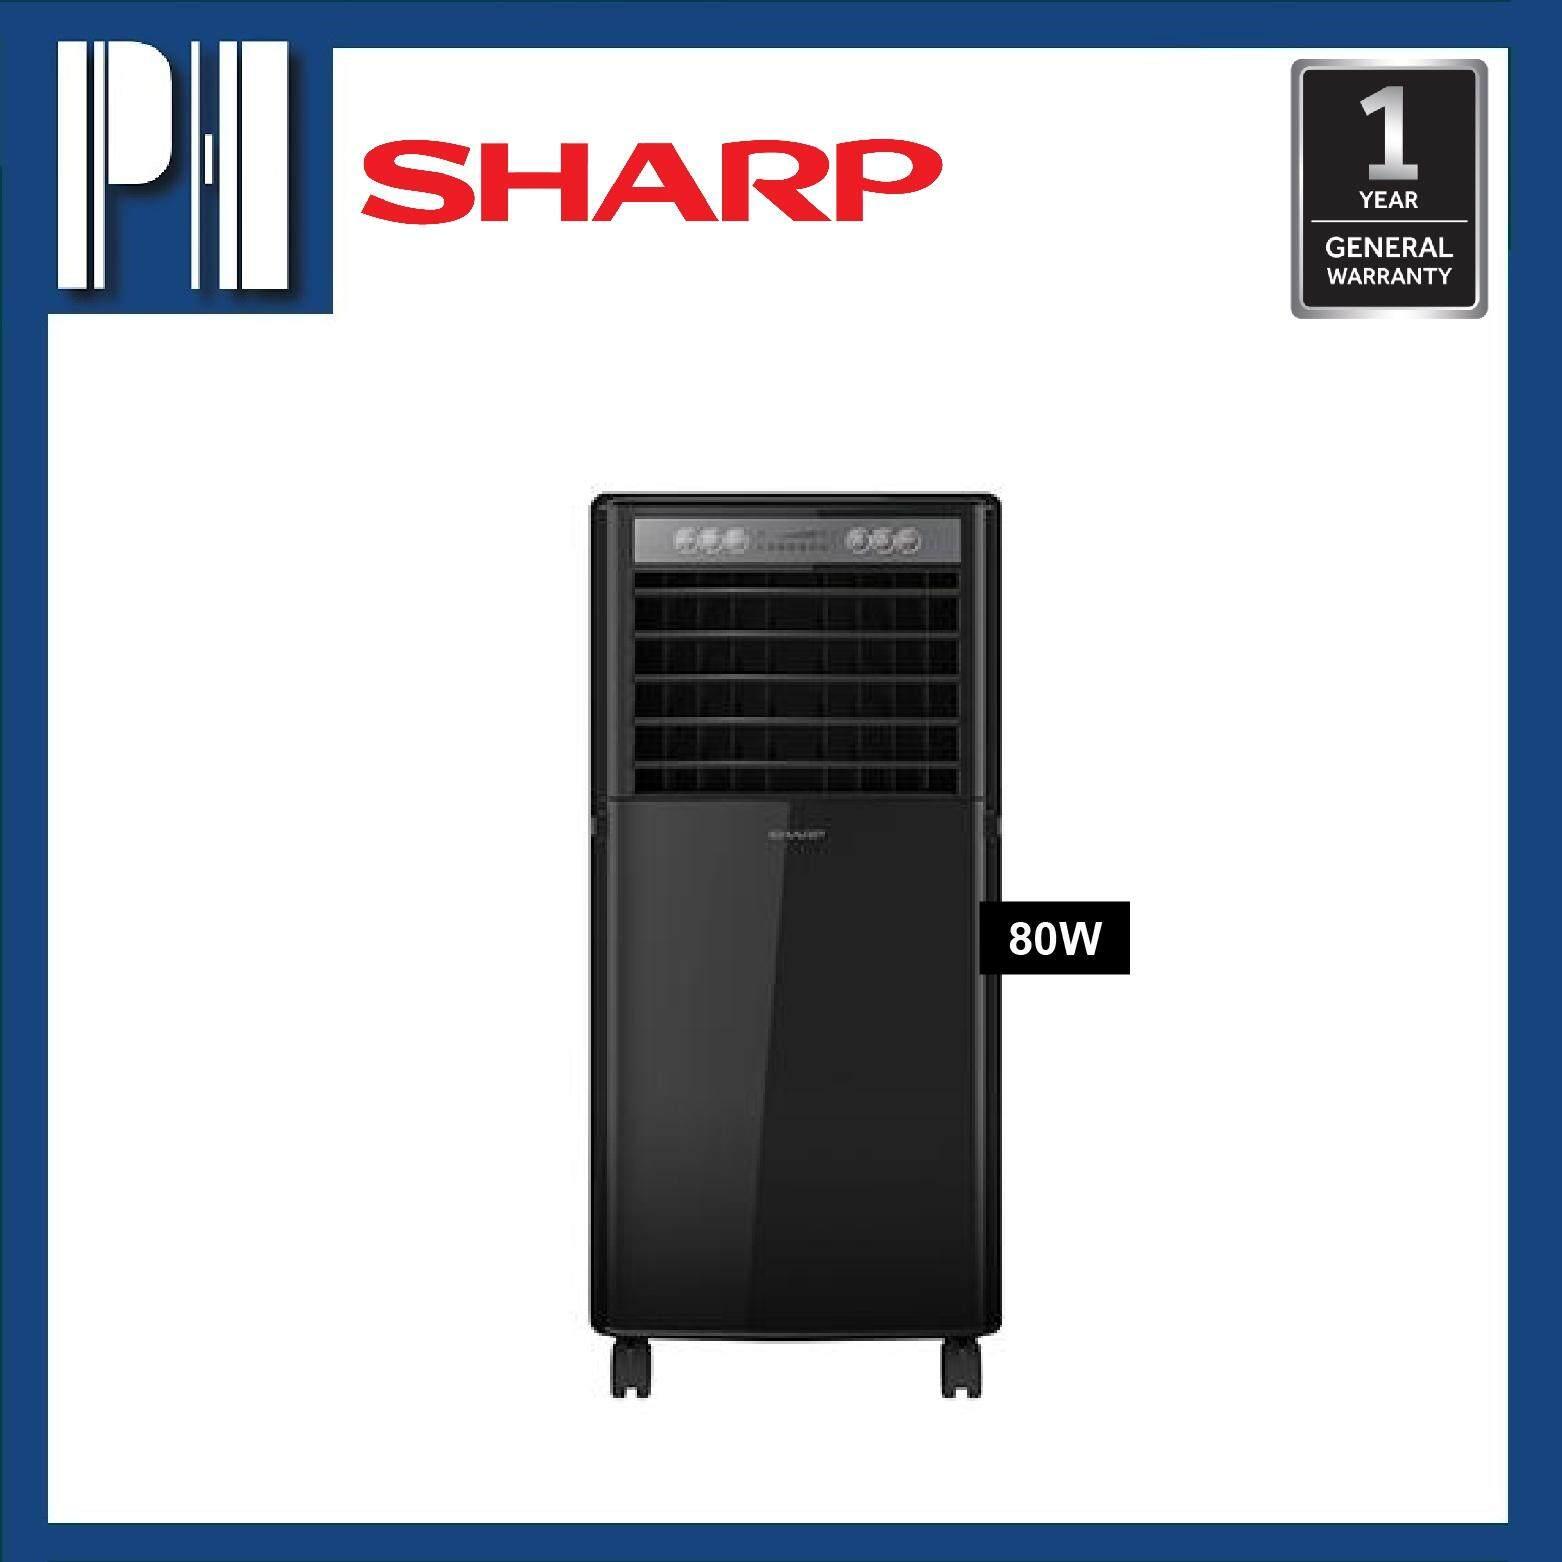 SHARP PJA77TVB 80W Air Cooler